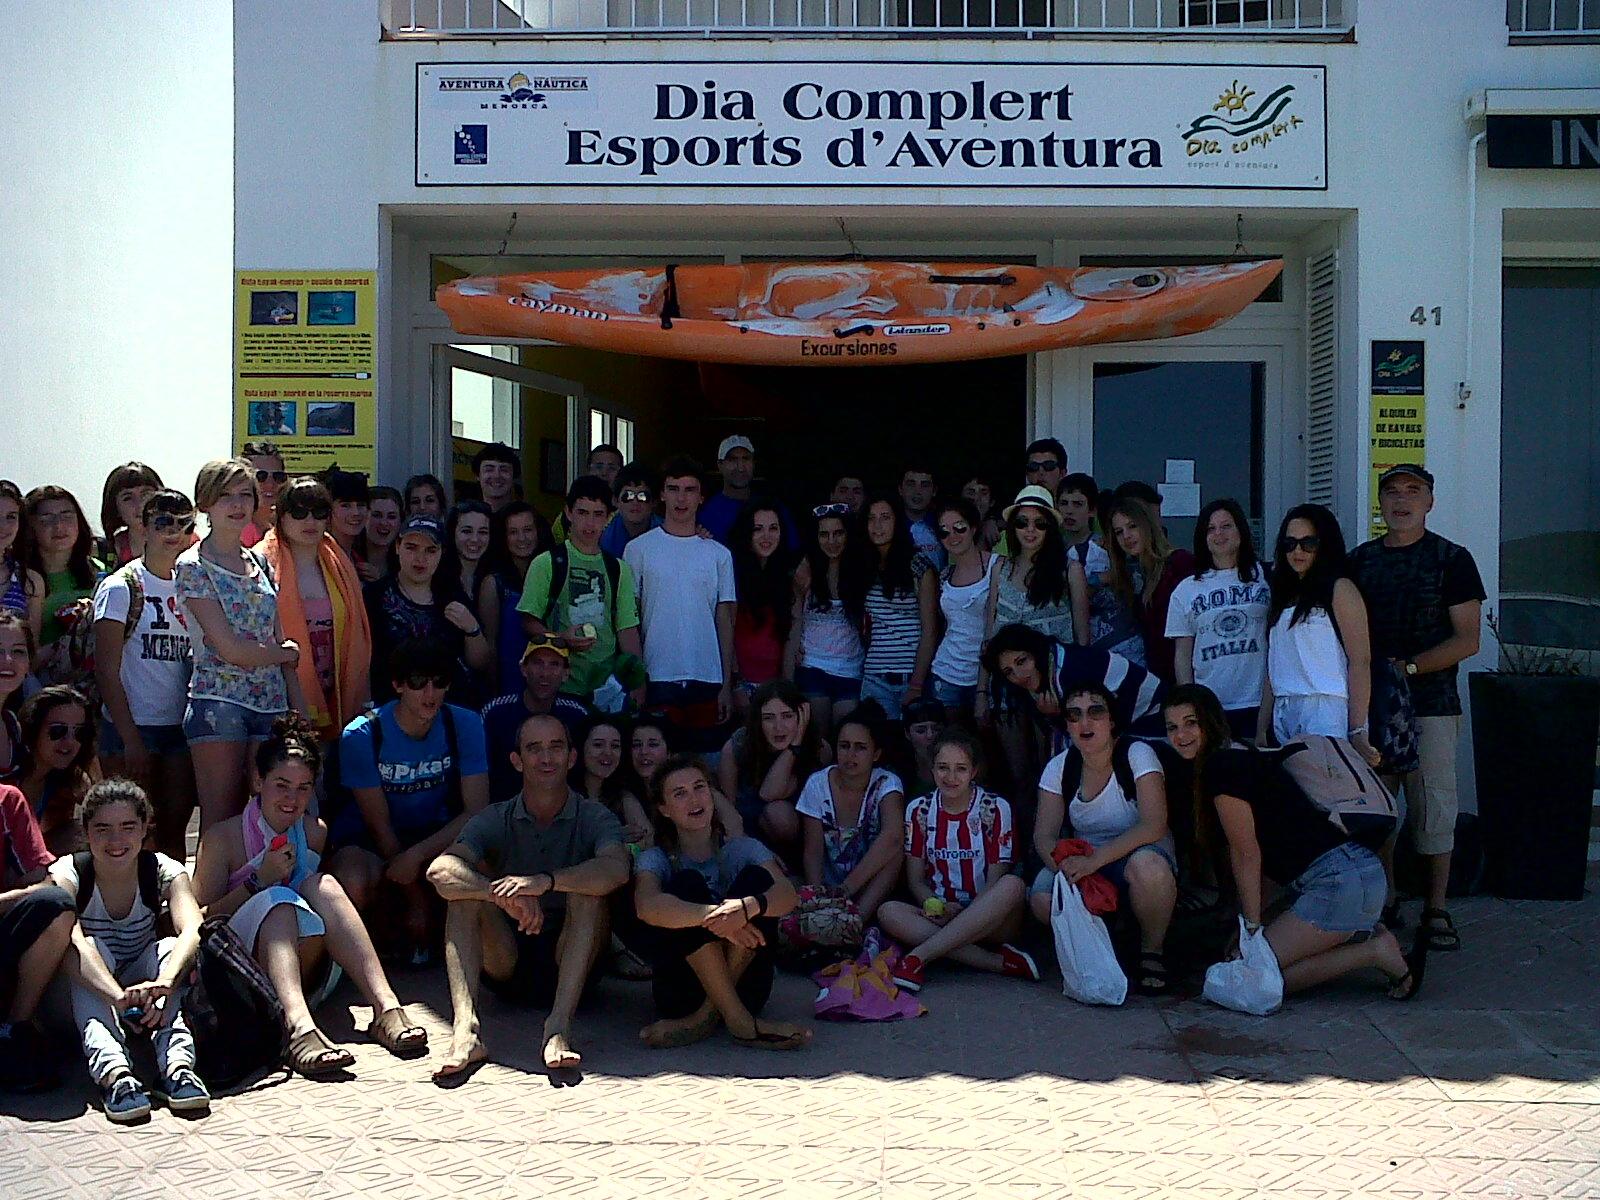 Menorca school groups